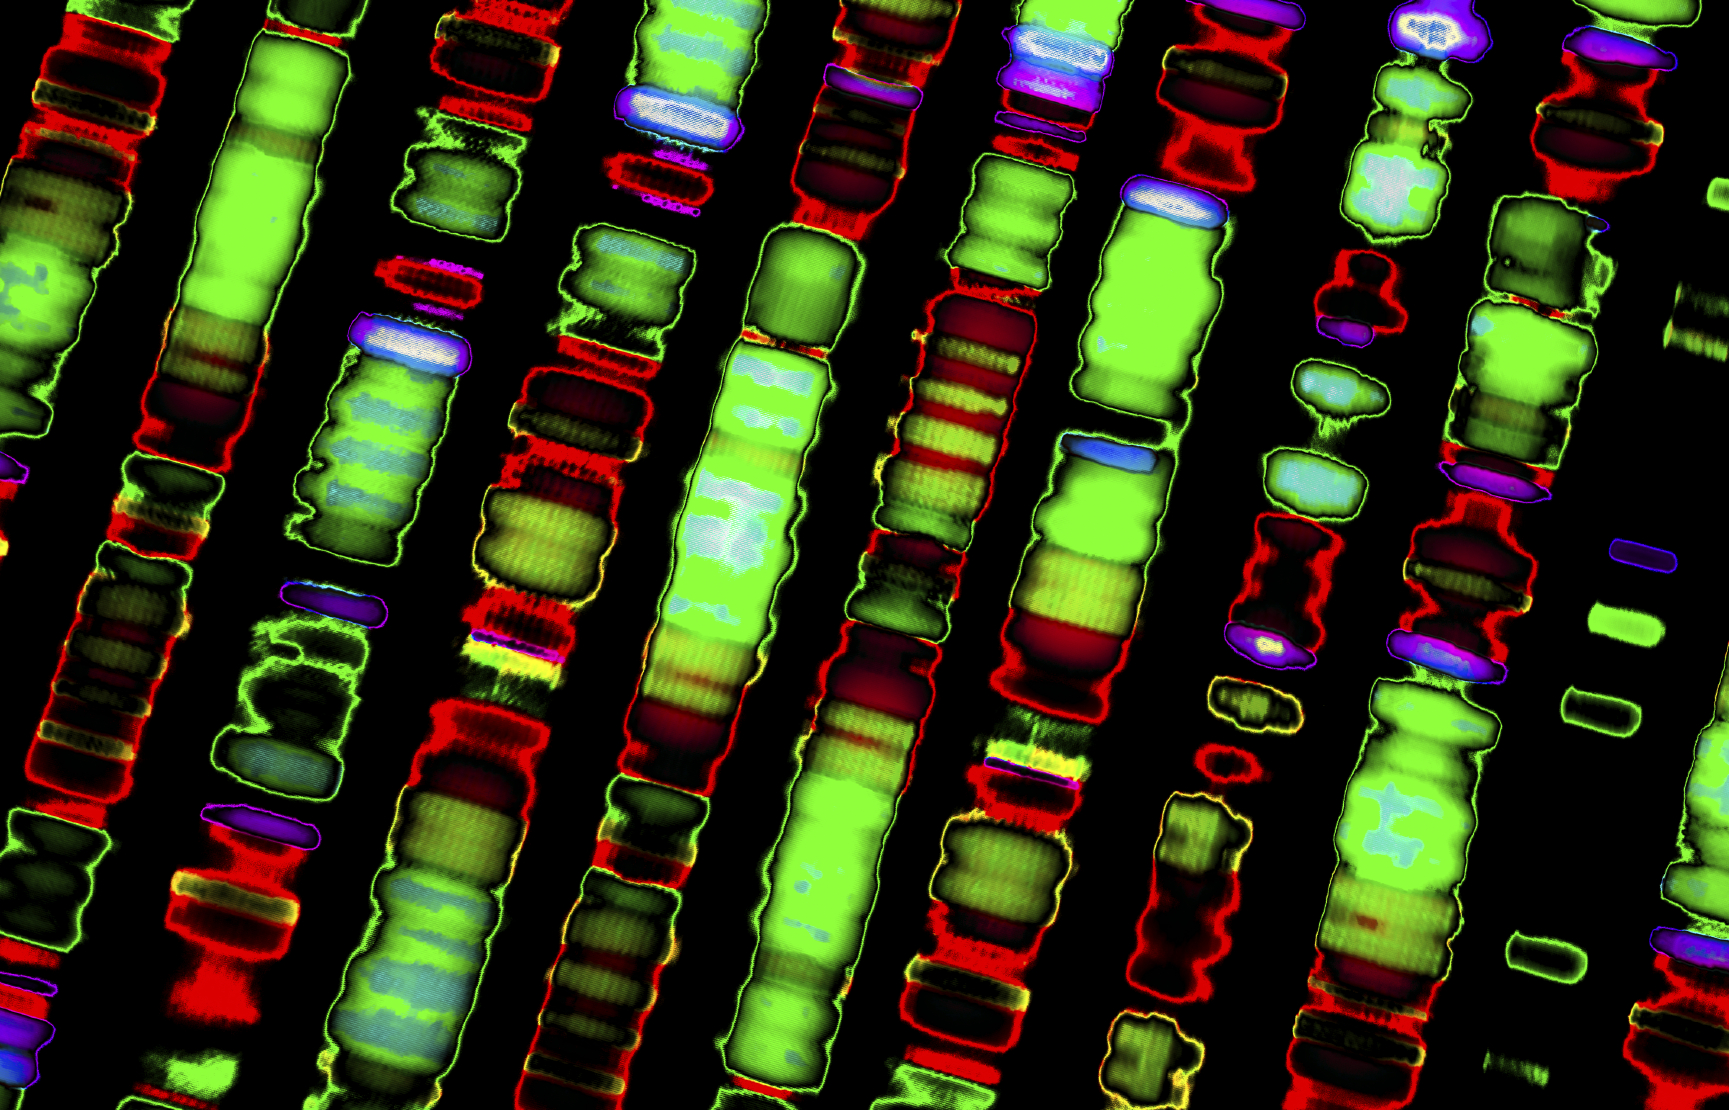 Sophia Genetics unveils latest 'genome browser' software - Pharmaphorum